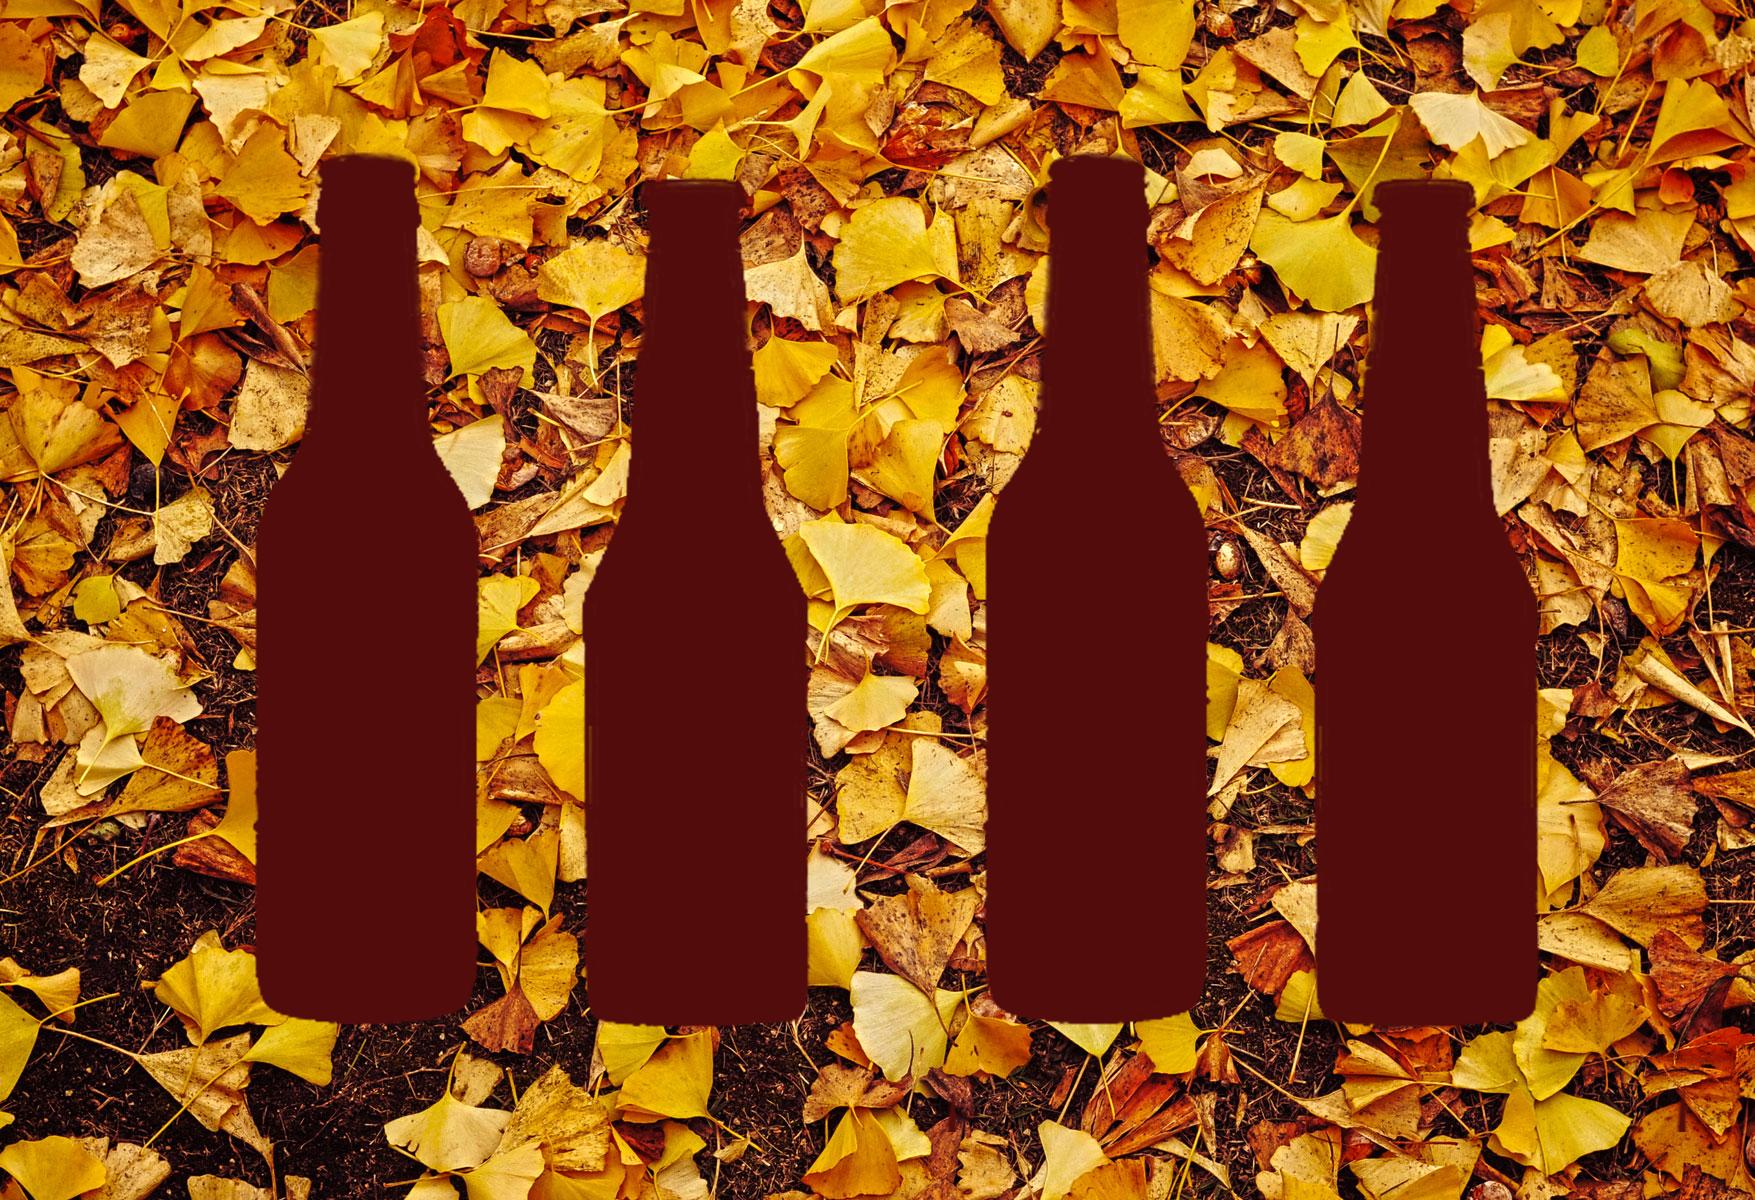 Cervezas de otoño